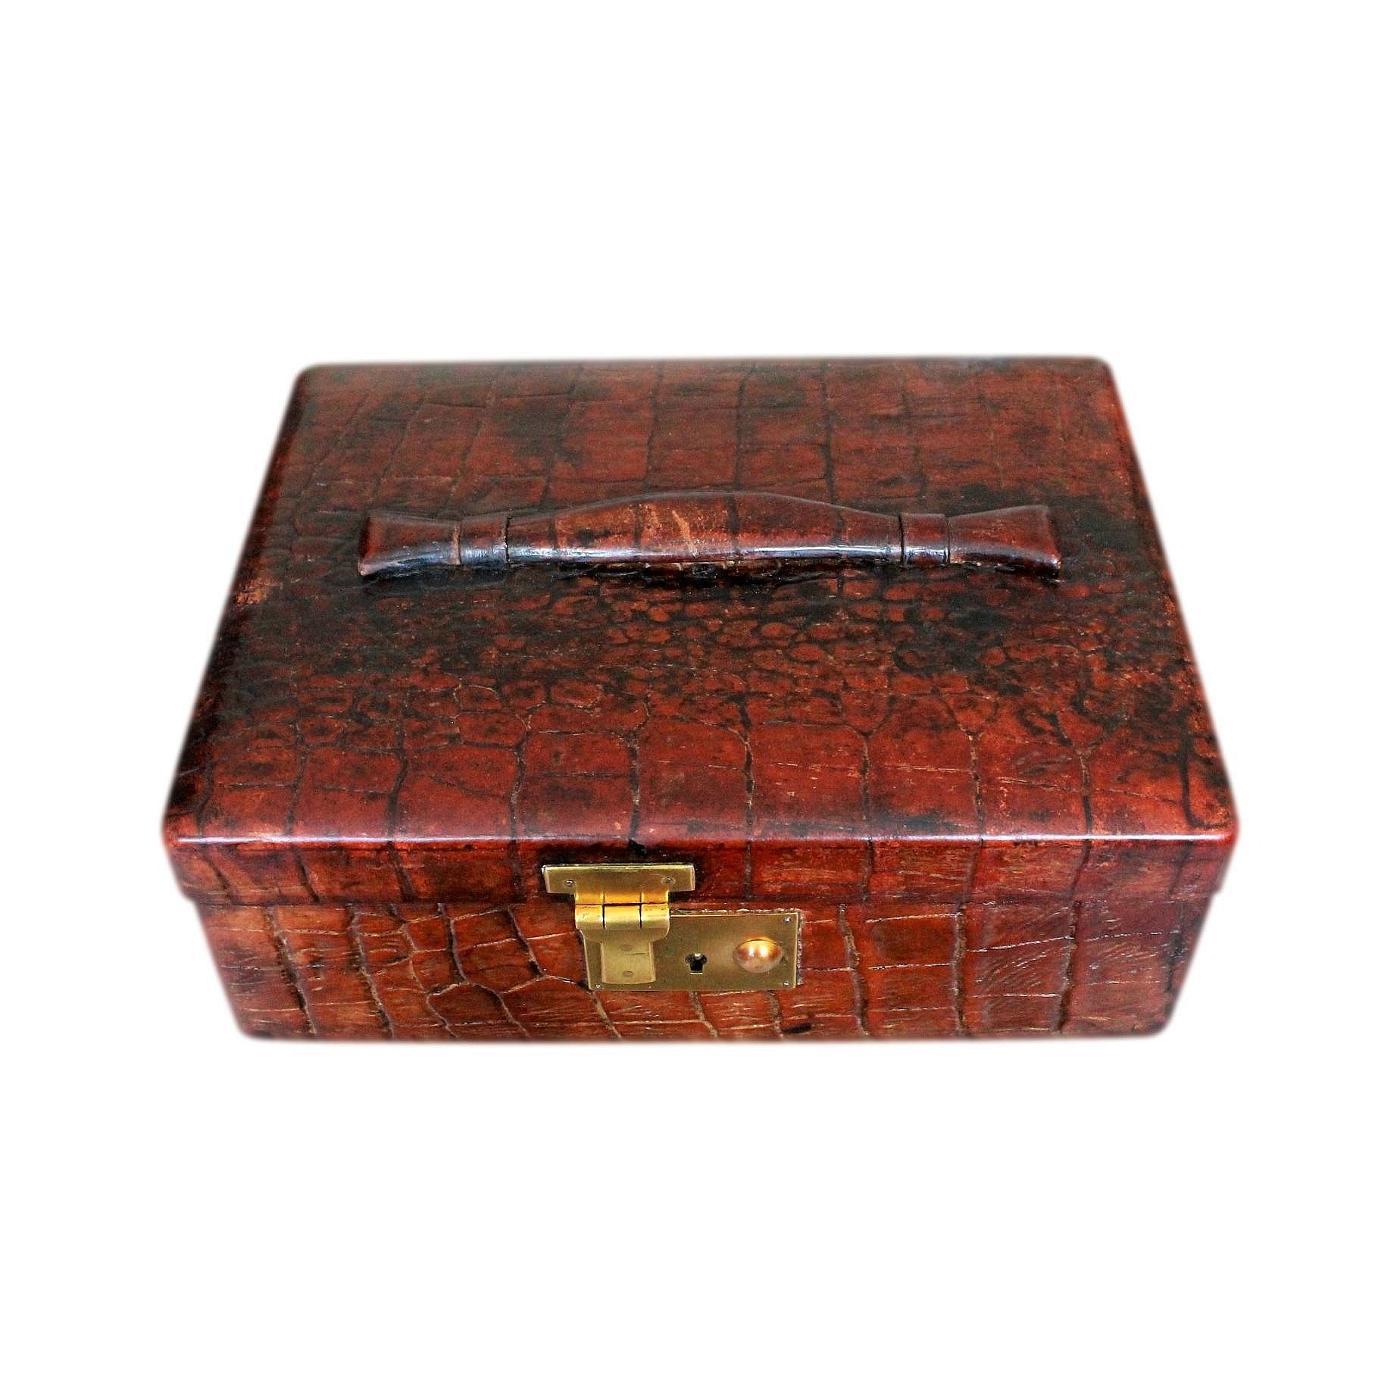 Stylish Art Deco Alligator Skin Jewellery Box